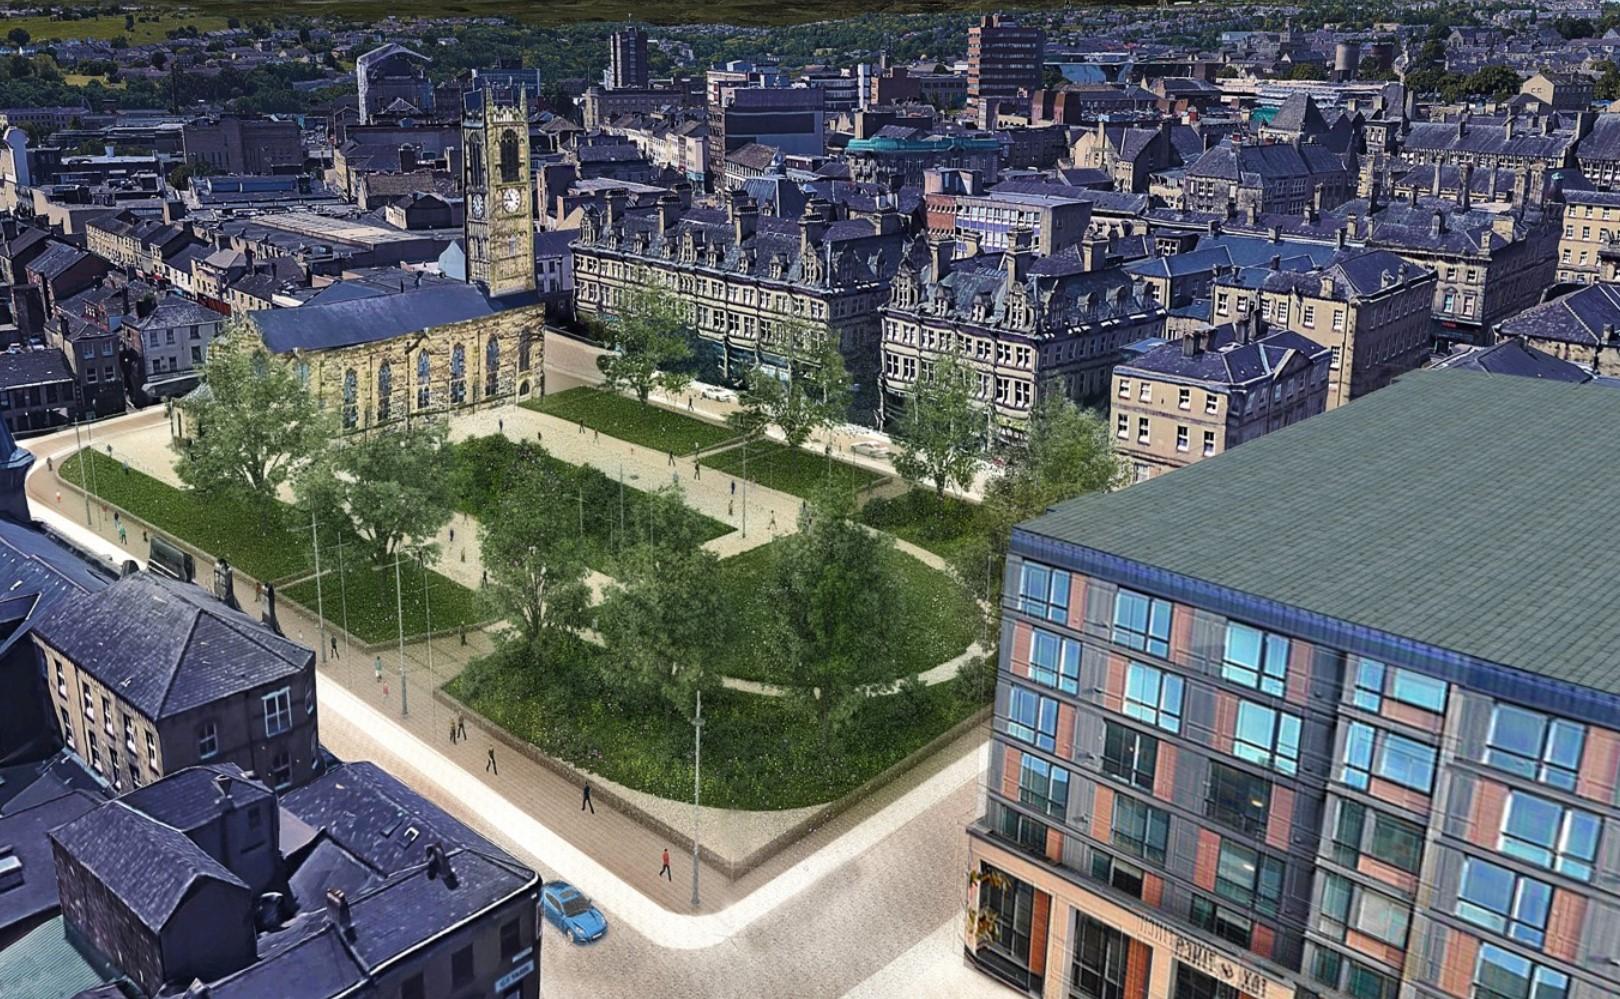 £100million Investment Plan for Huddersfield and Dewsbury Blueprints Gets Green Light